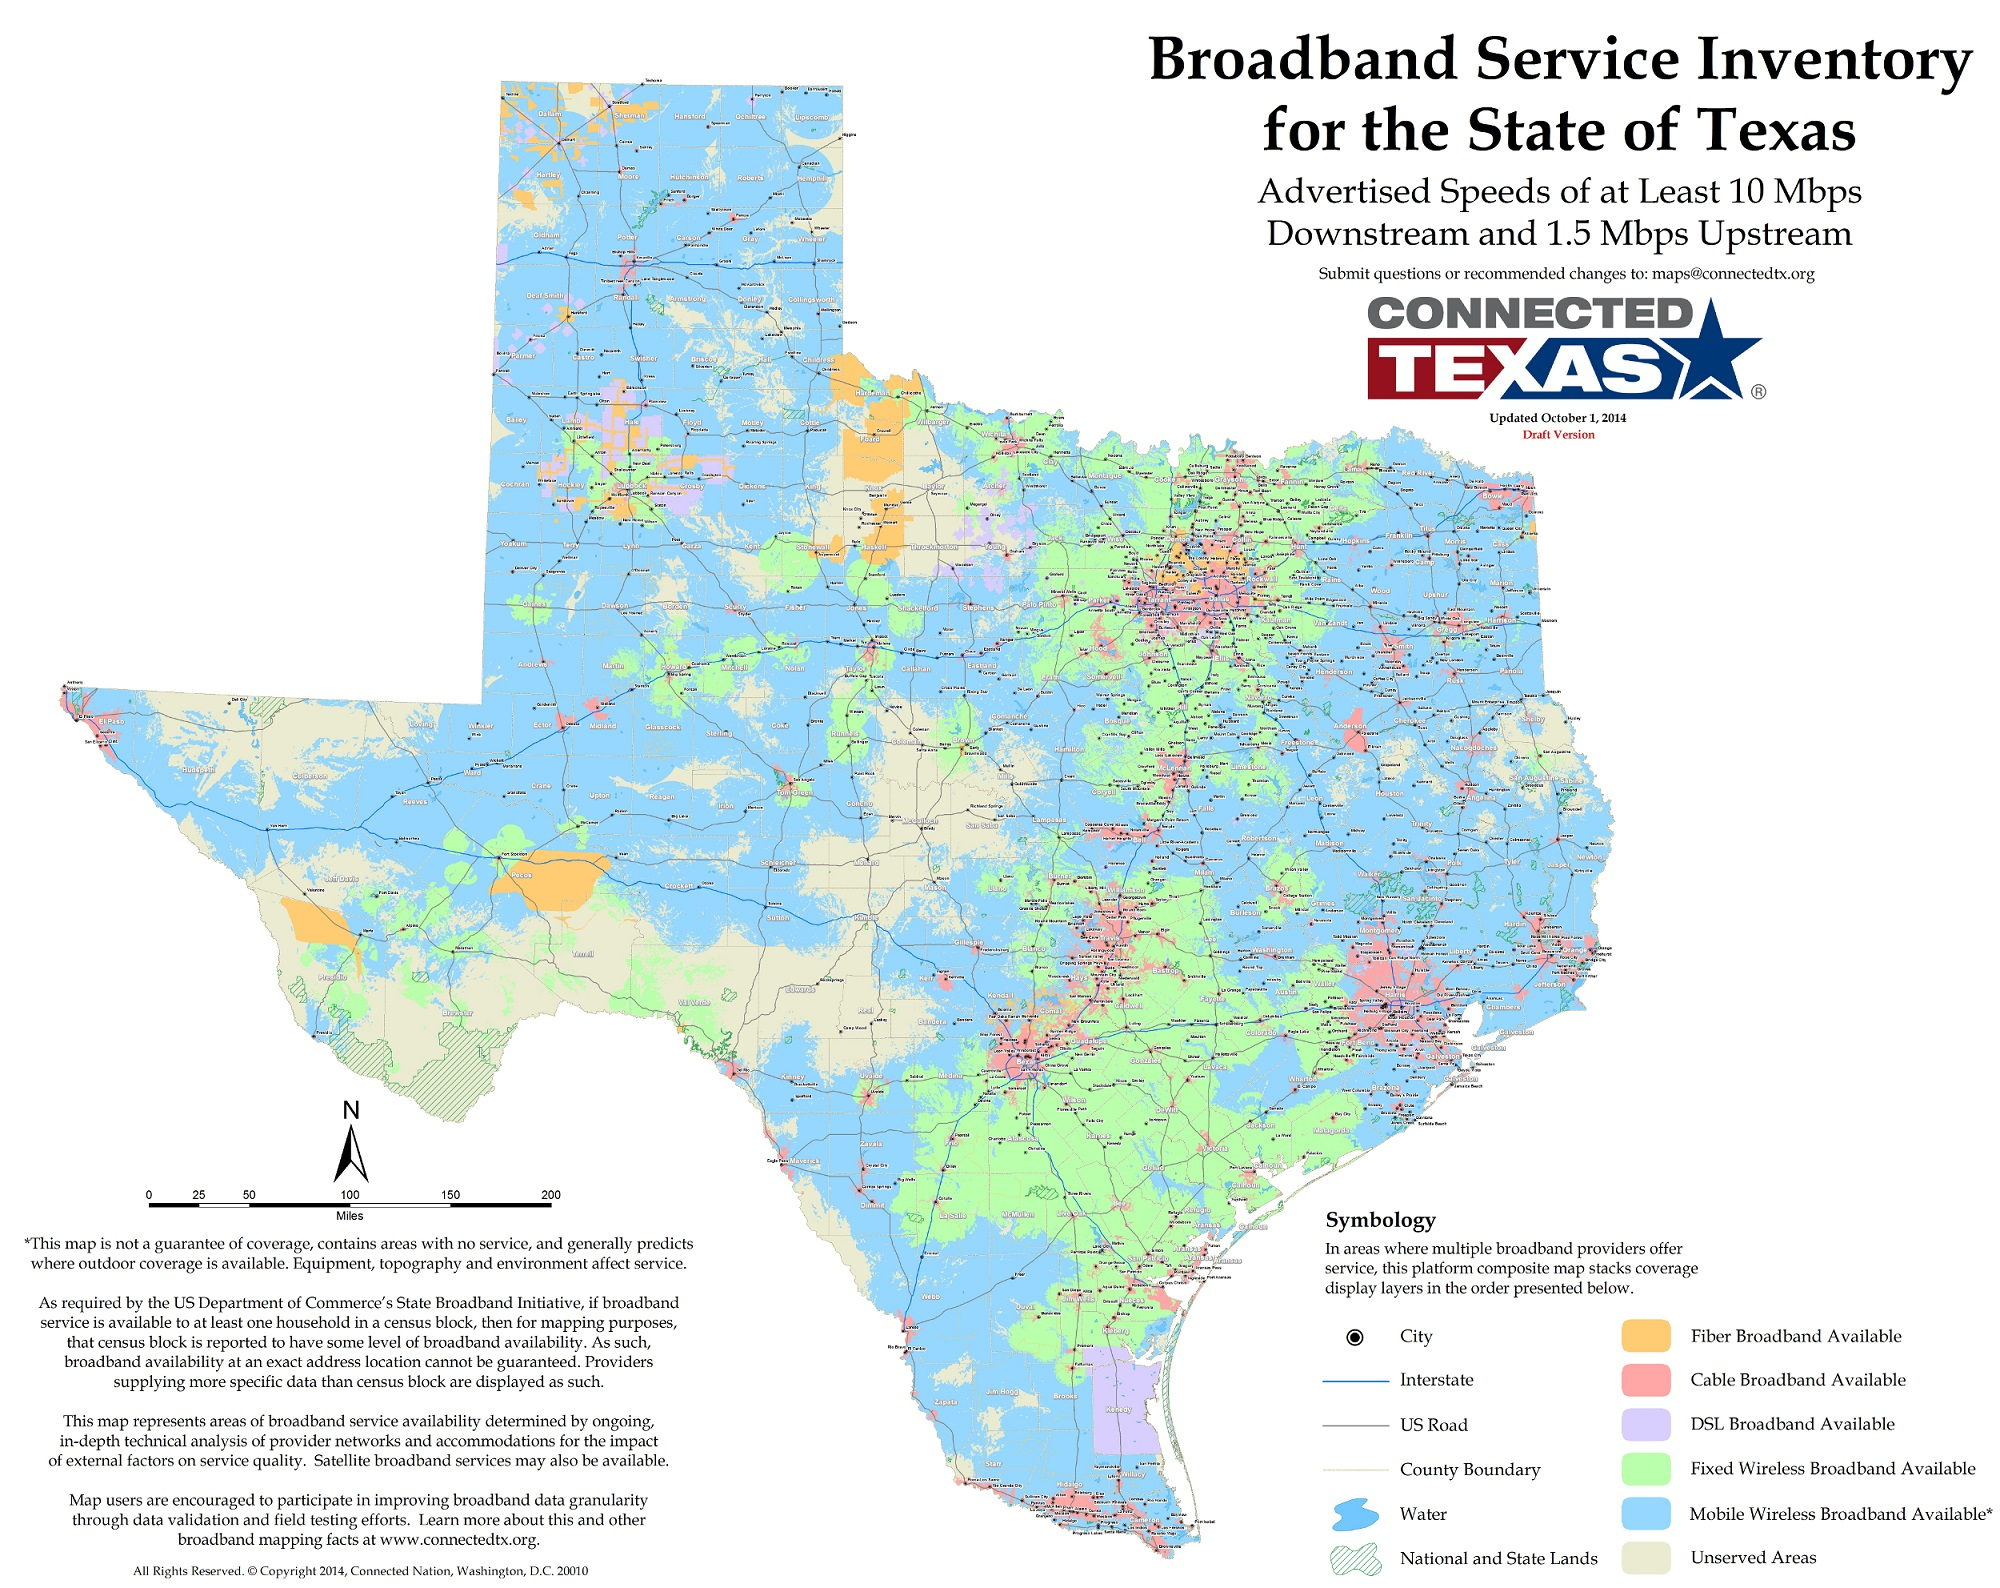 Connected Texas | - Texas Fiber Optic Map